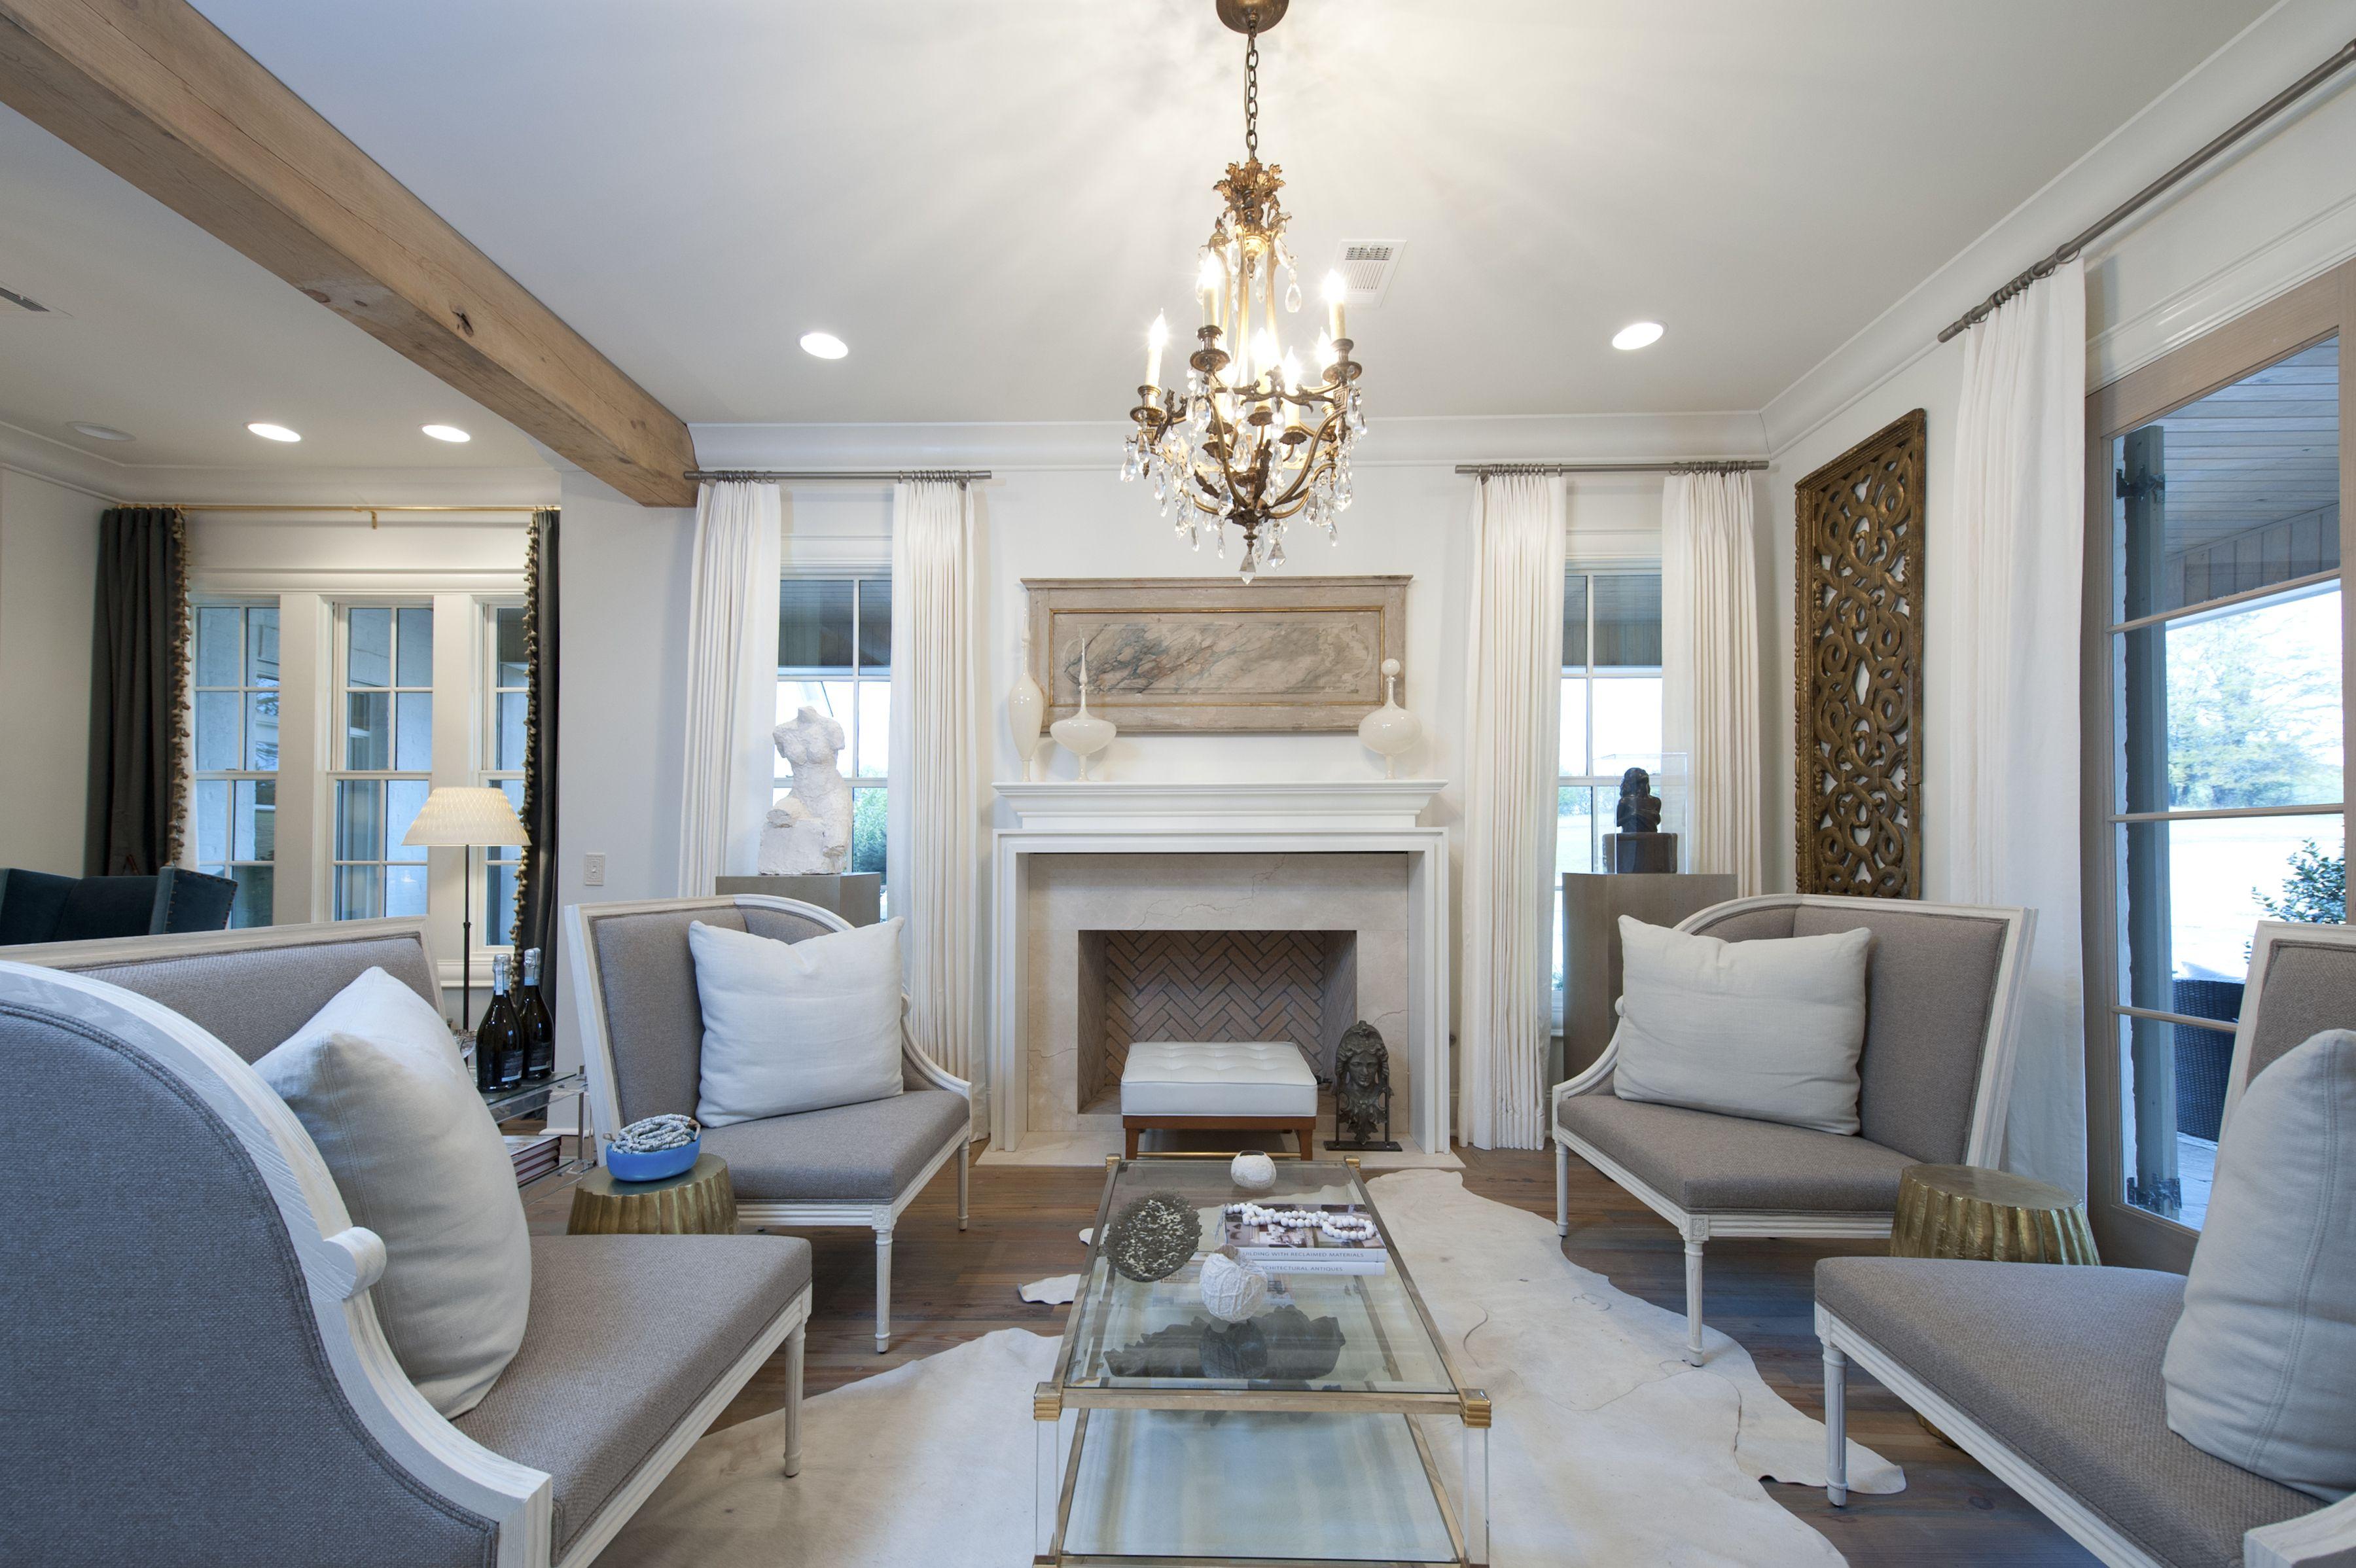 Nancy price interior design show house at livingston madison ms also rh pinterest